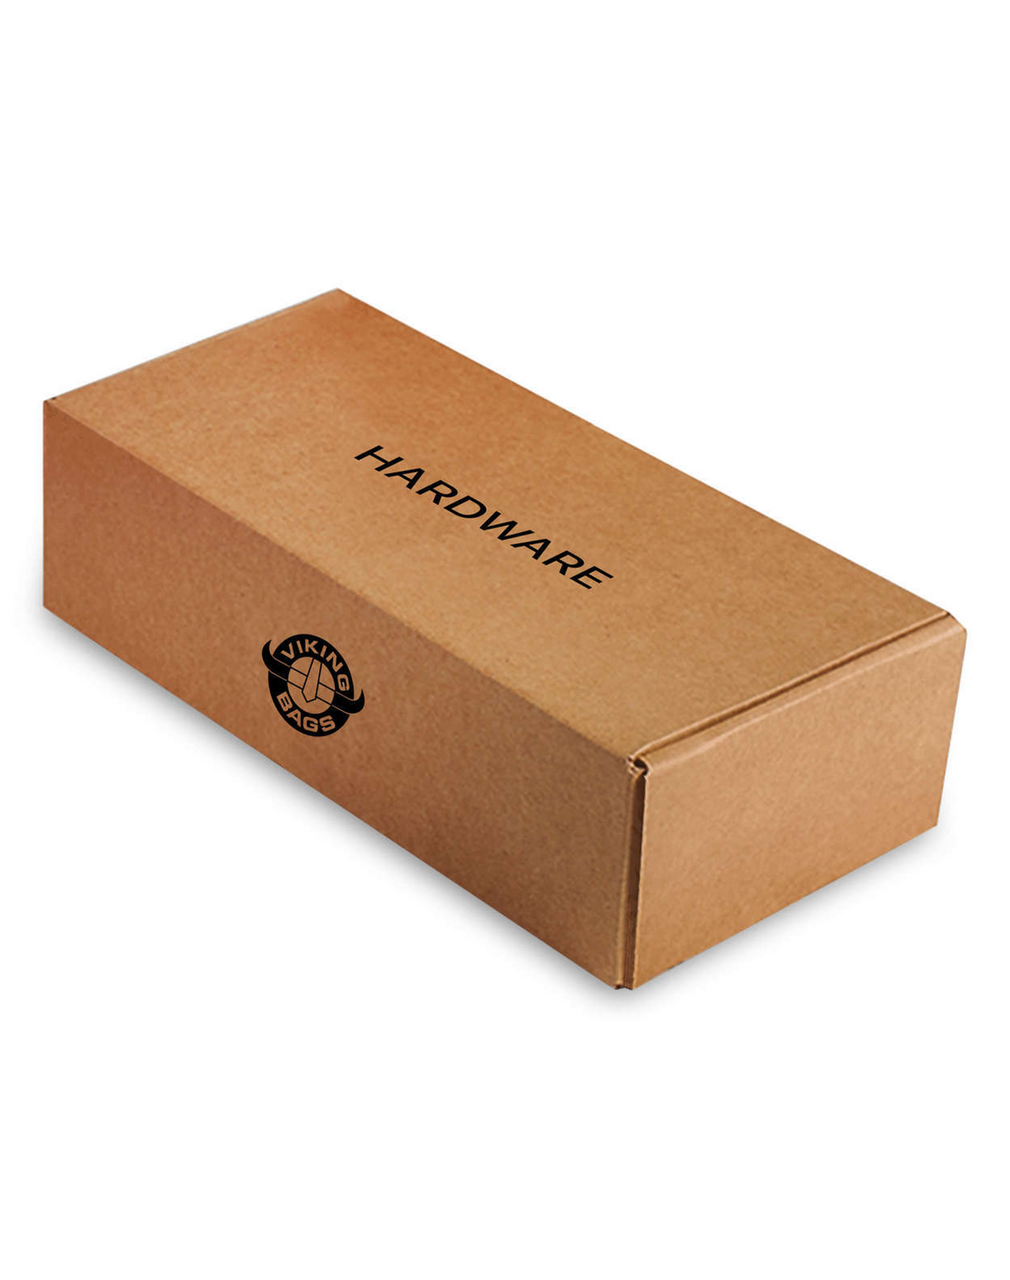 Honda 750 Shadow Aero Thor Series Small Motorcycle Saddlebags Box